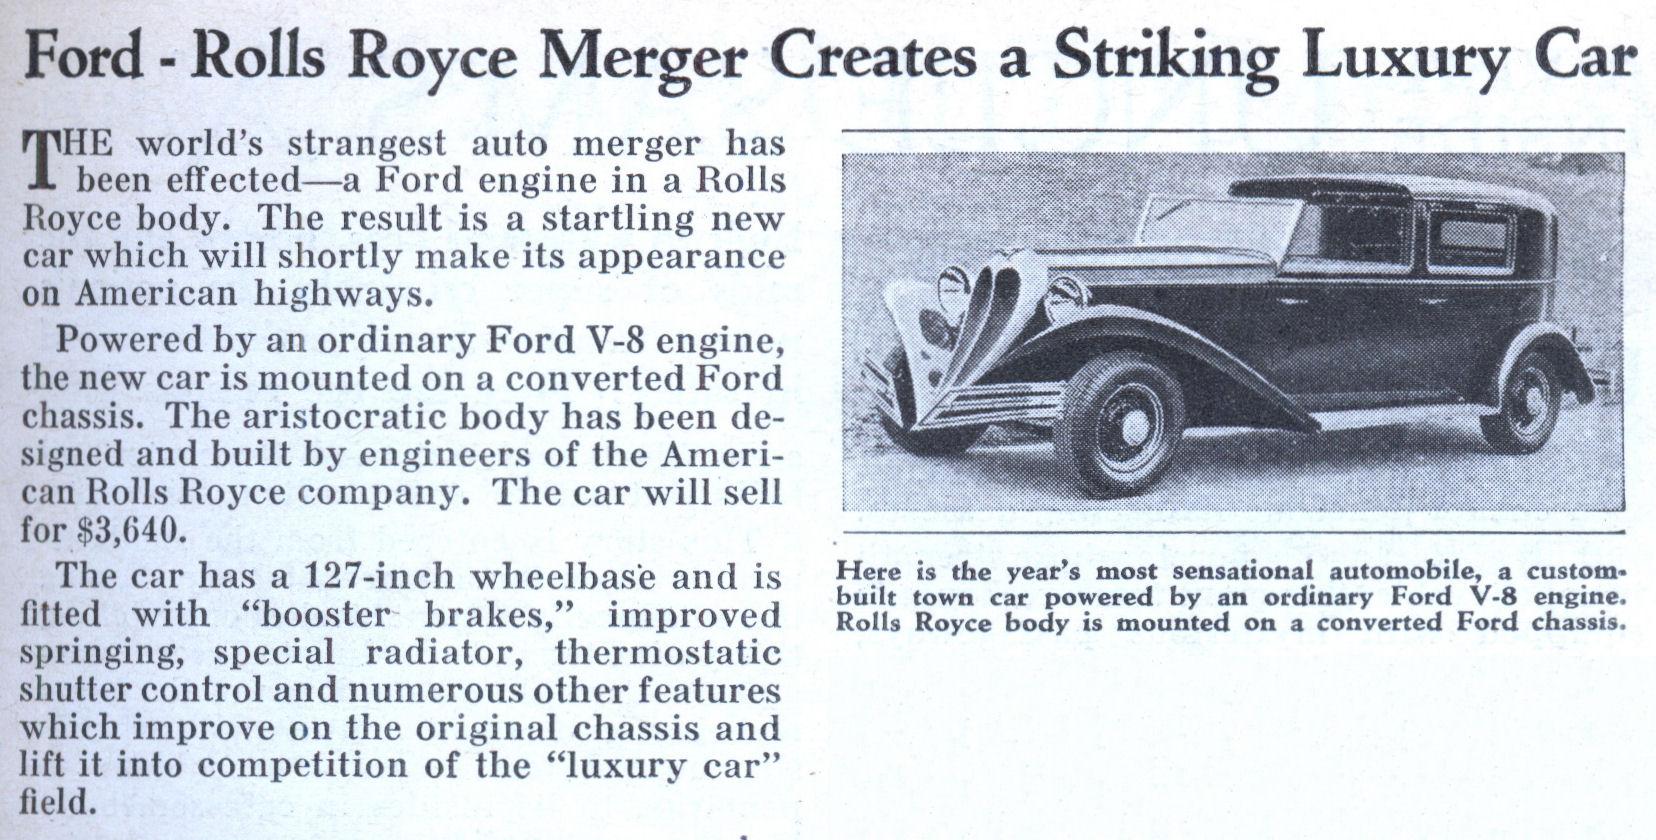 Ford Rolls Royce Merger